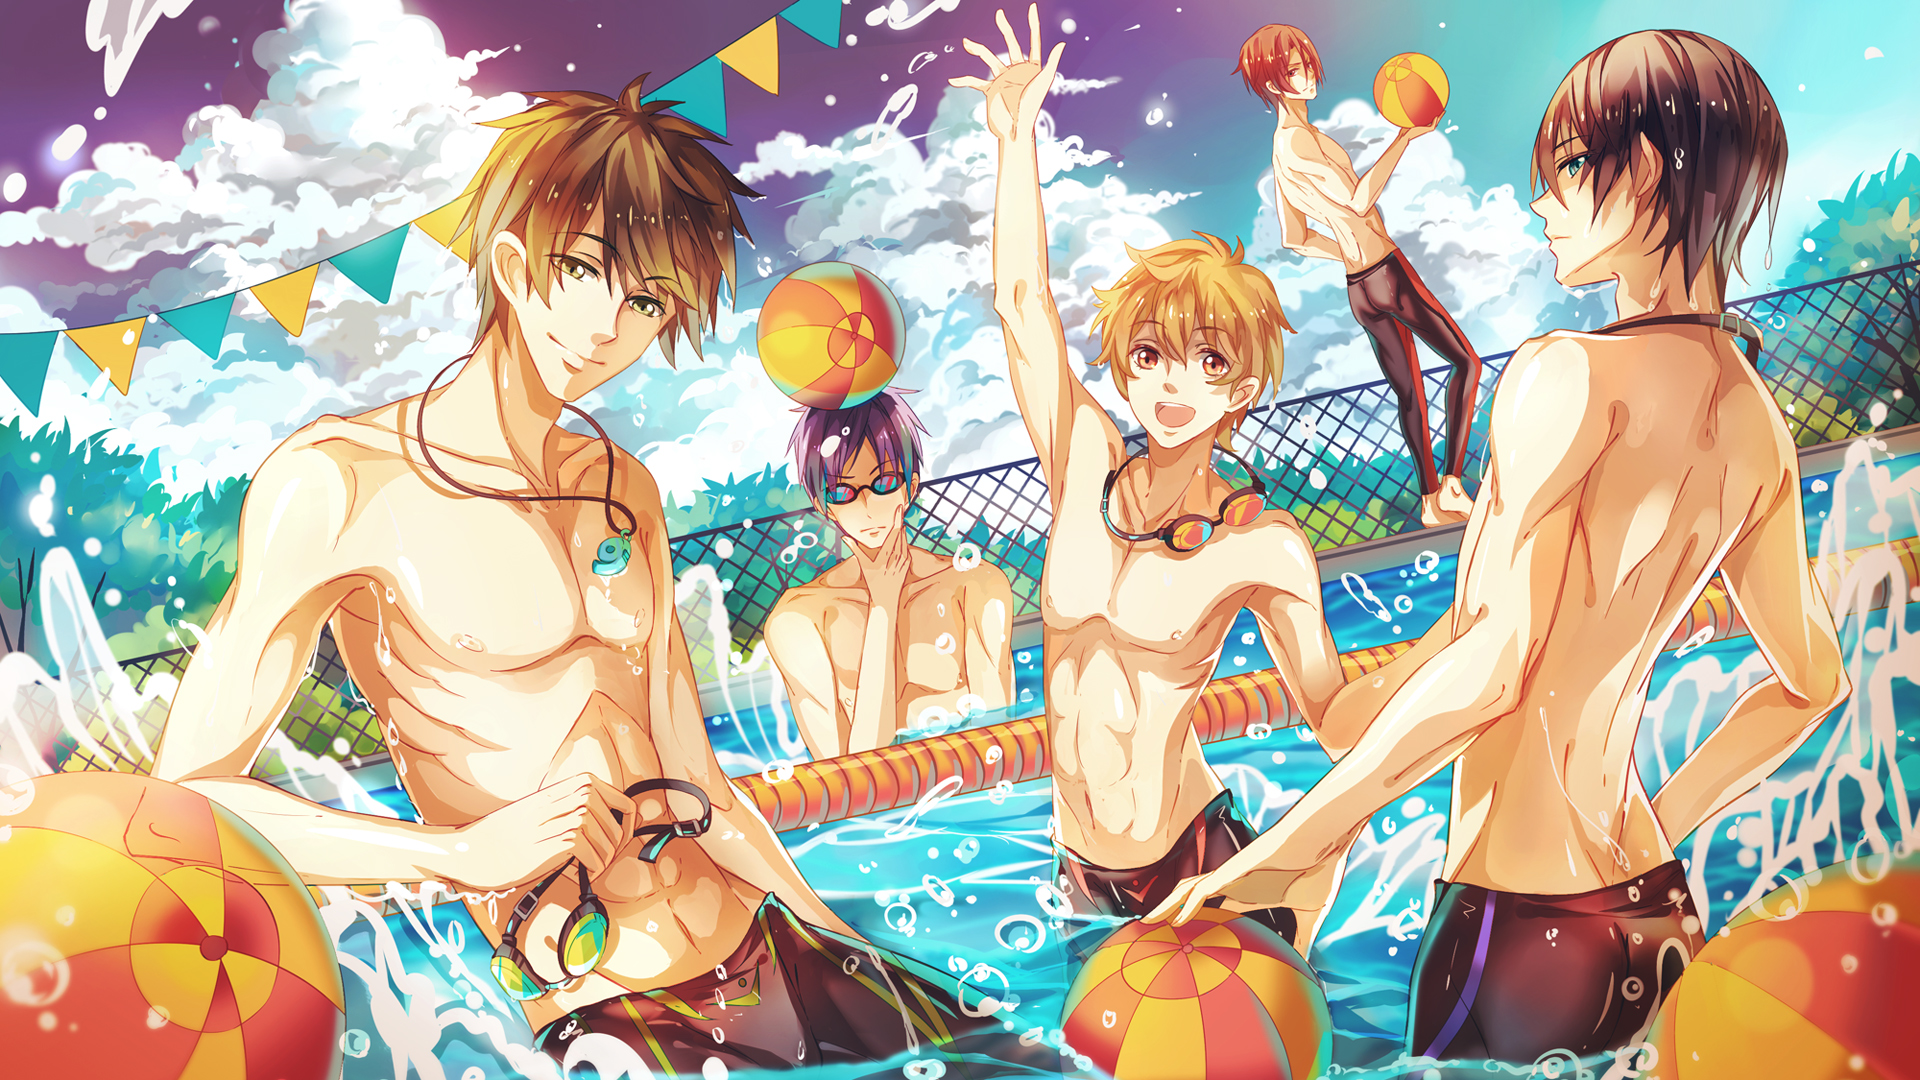 Free Anime S Wallpaper 1920x1080 83255